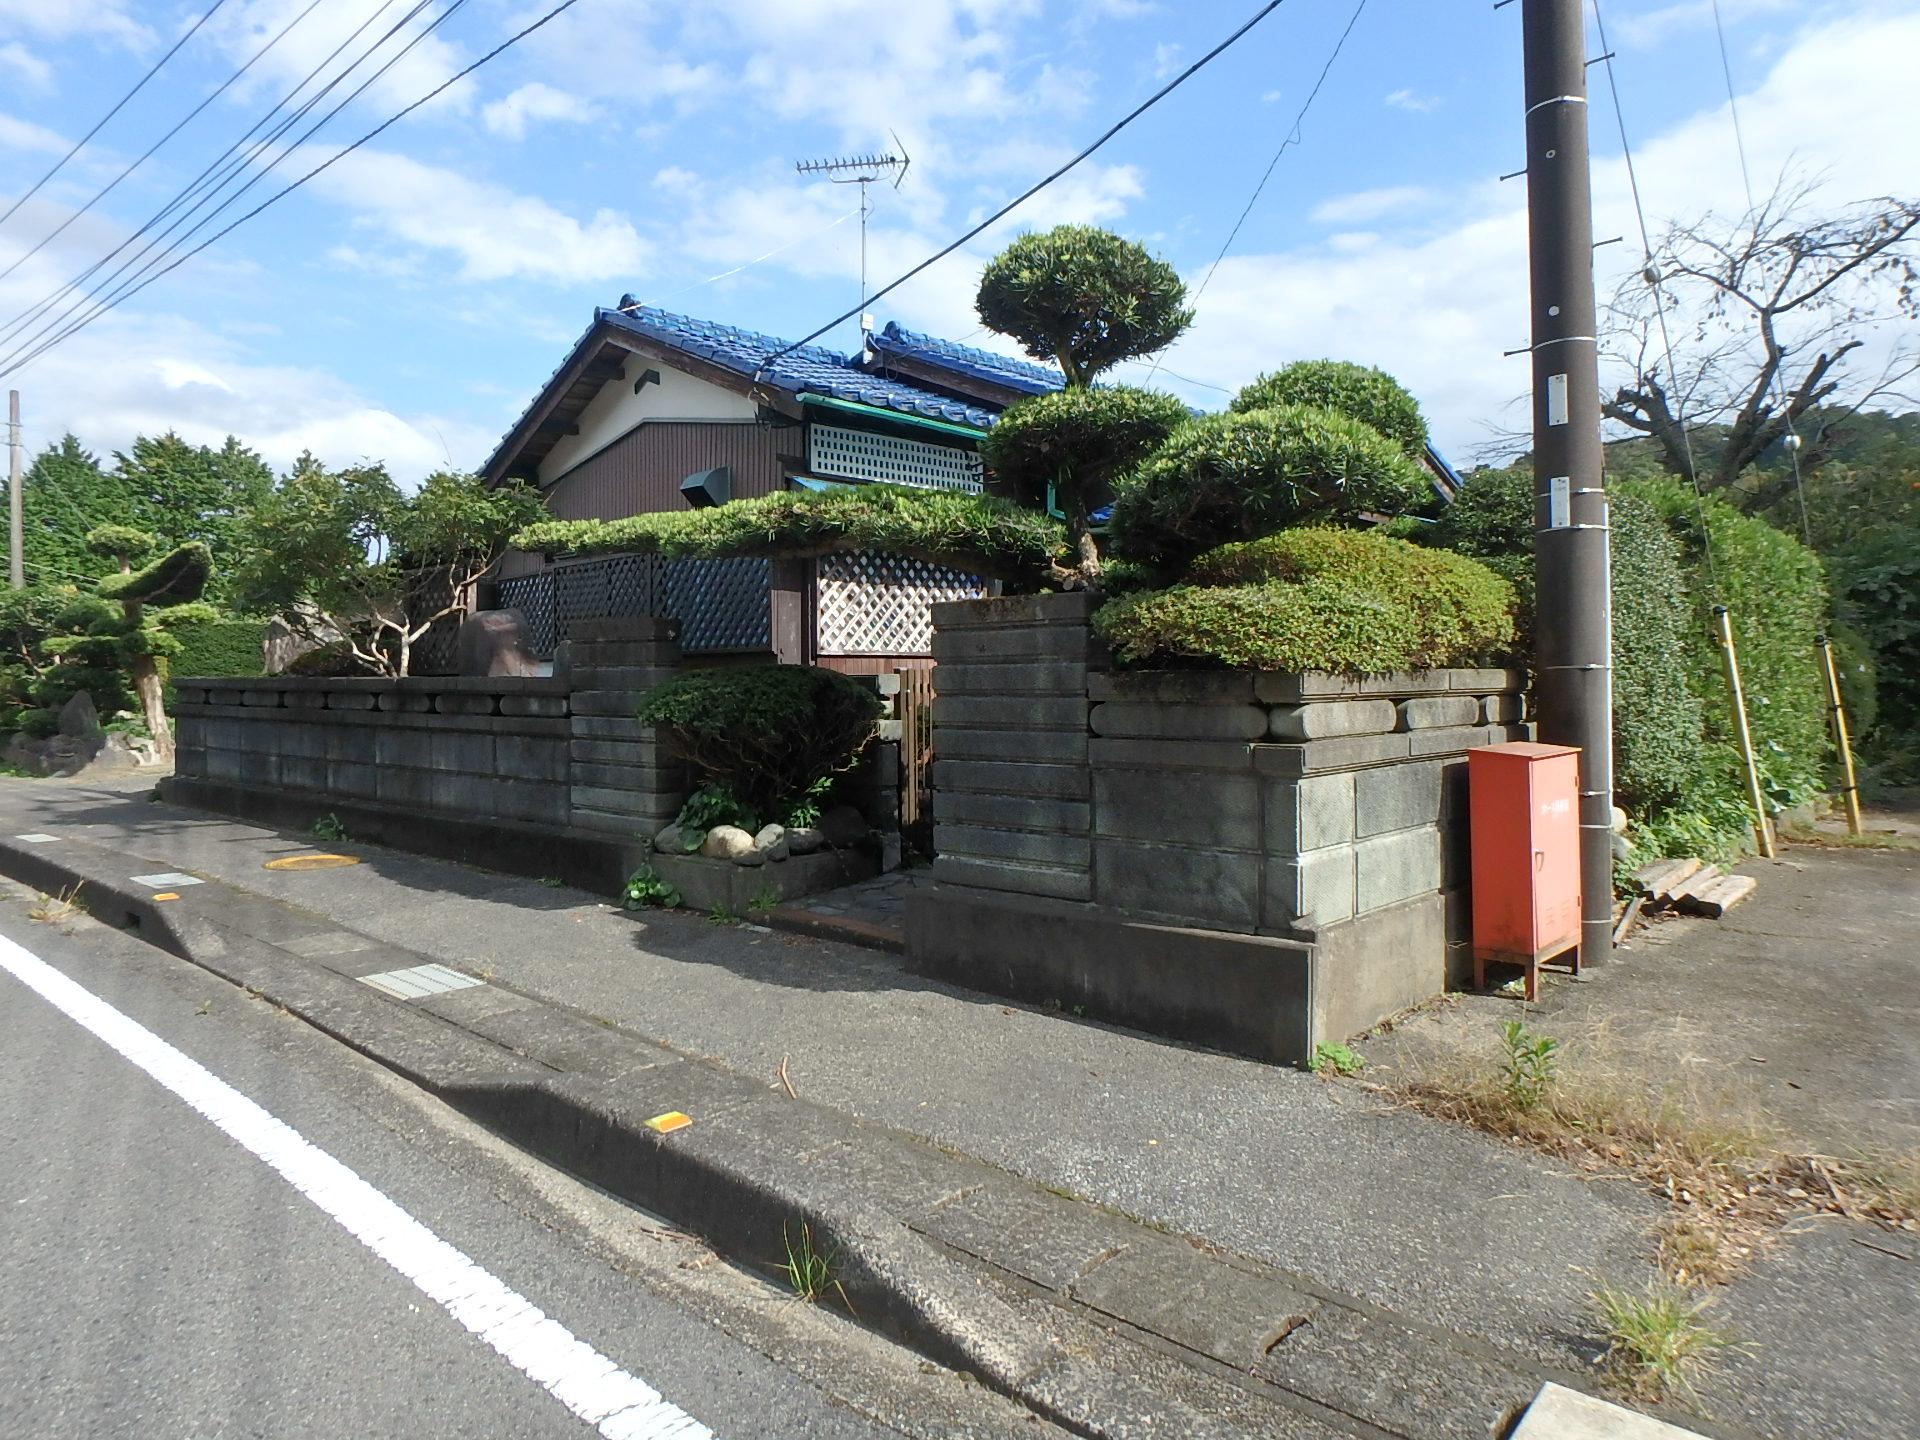 千葉県夷隅郡大多喜町堀切の不動産、中古戸建て、ご商談中